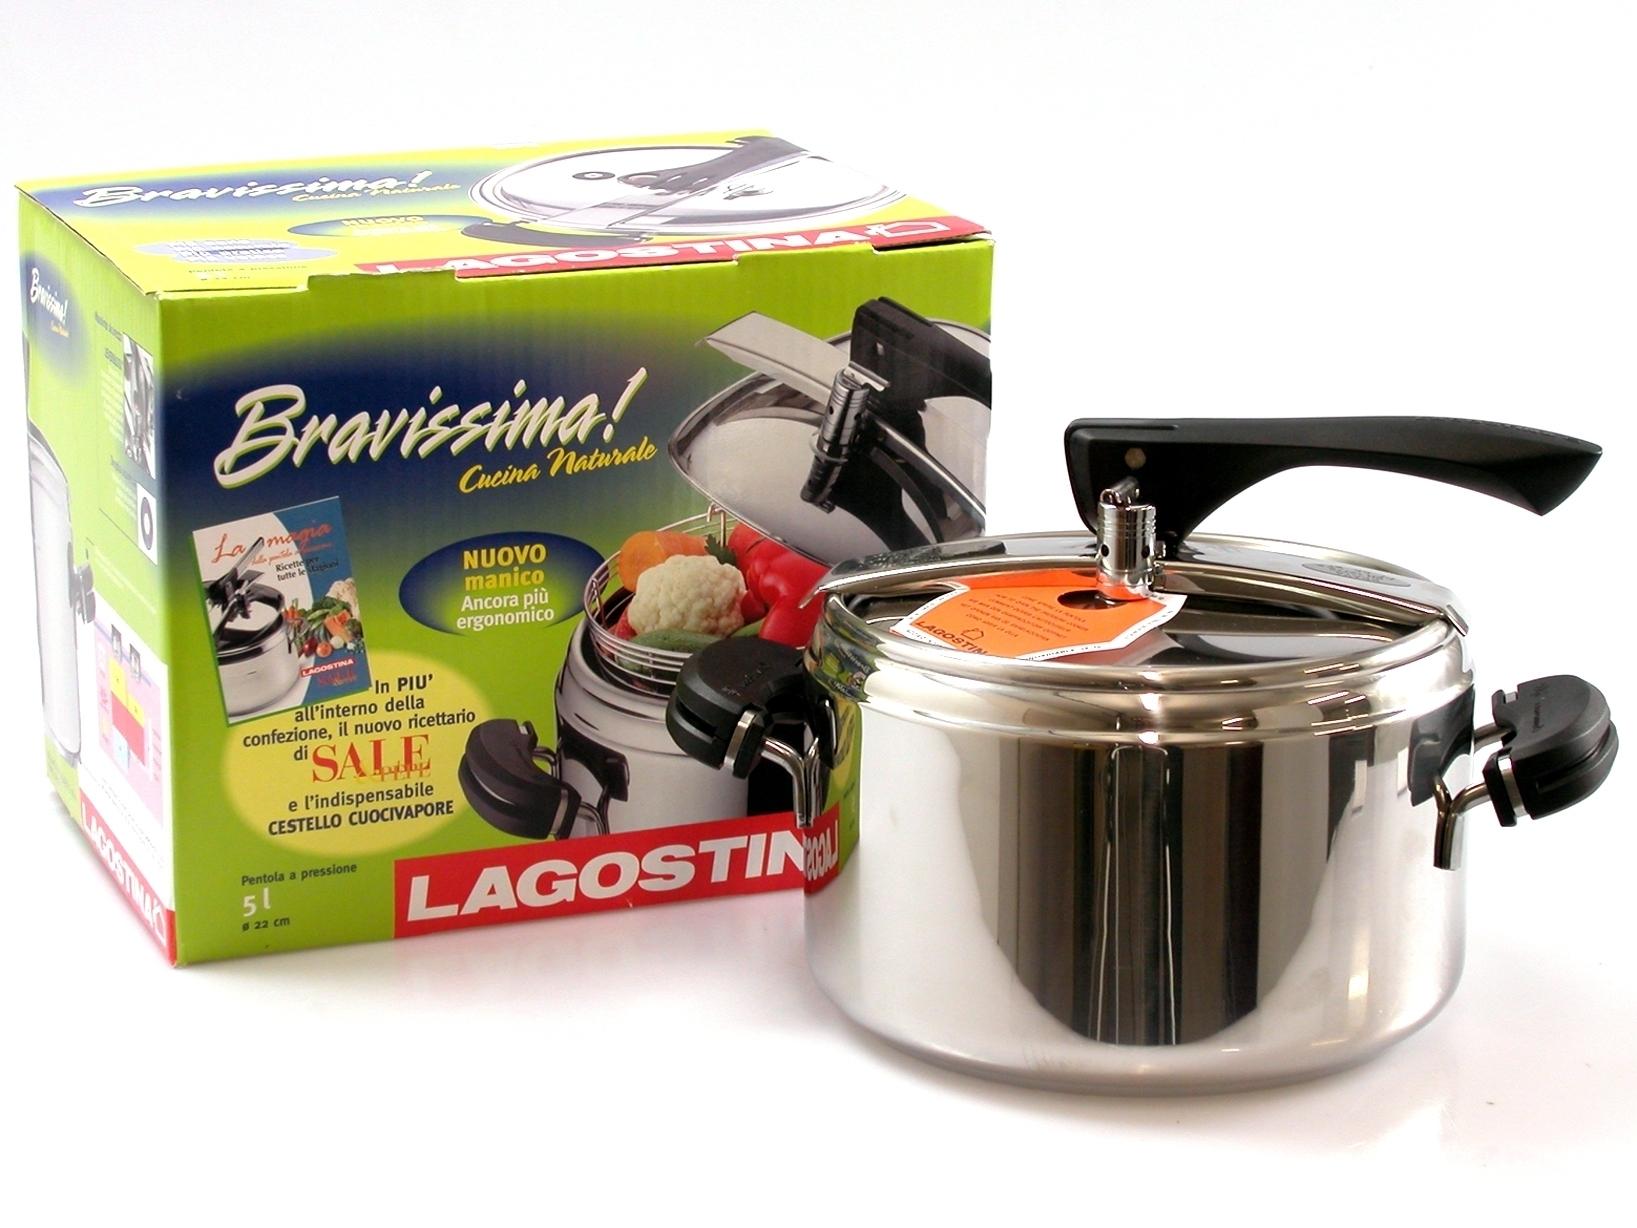 Buy Pressure Cooker Bravissima Natural 3116505 | Italy2Us.com